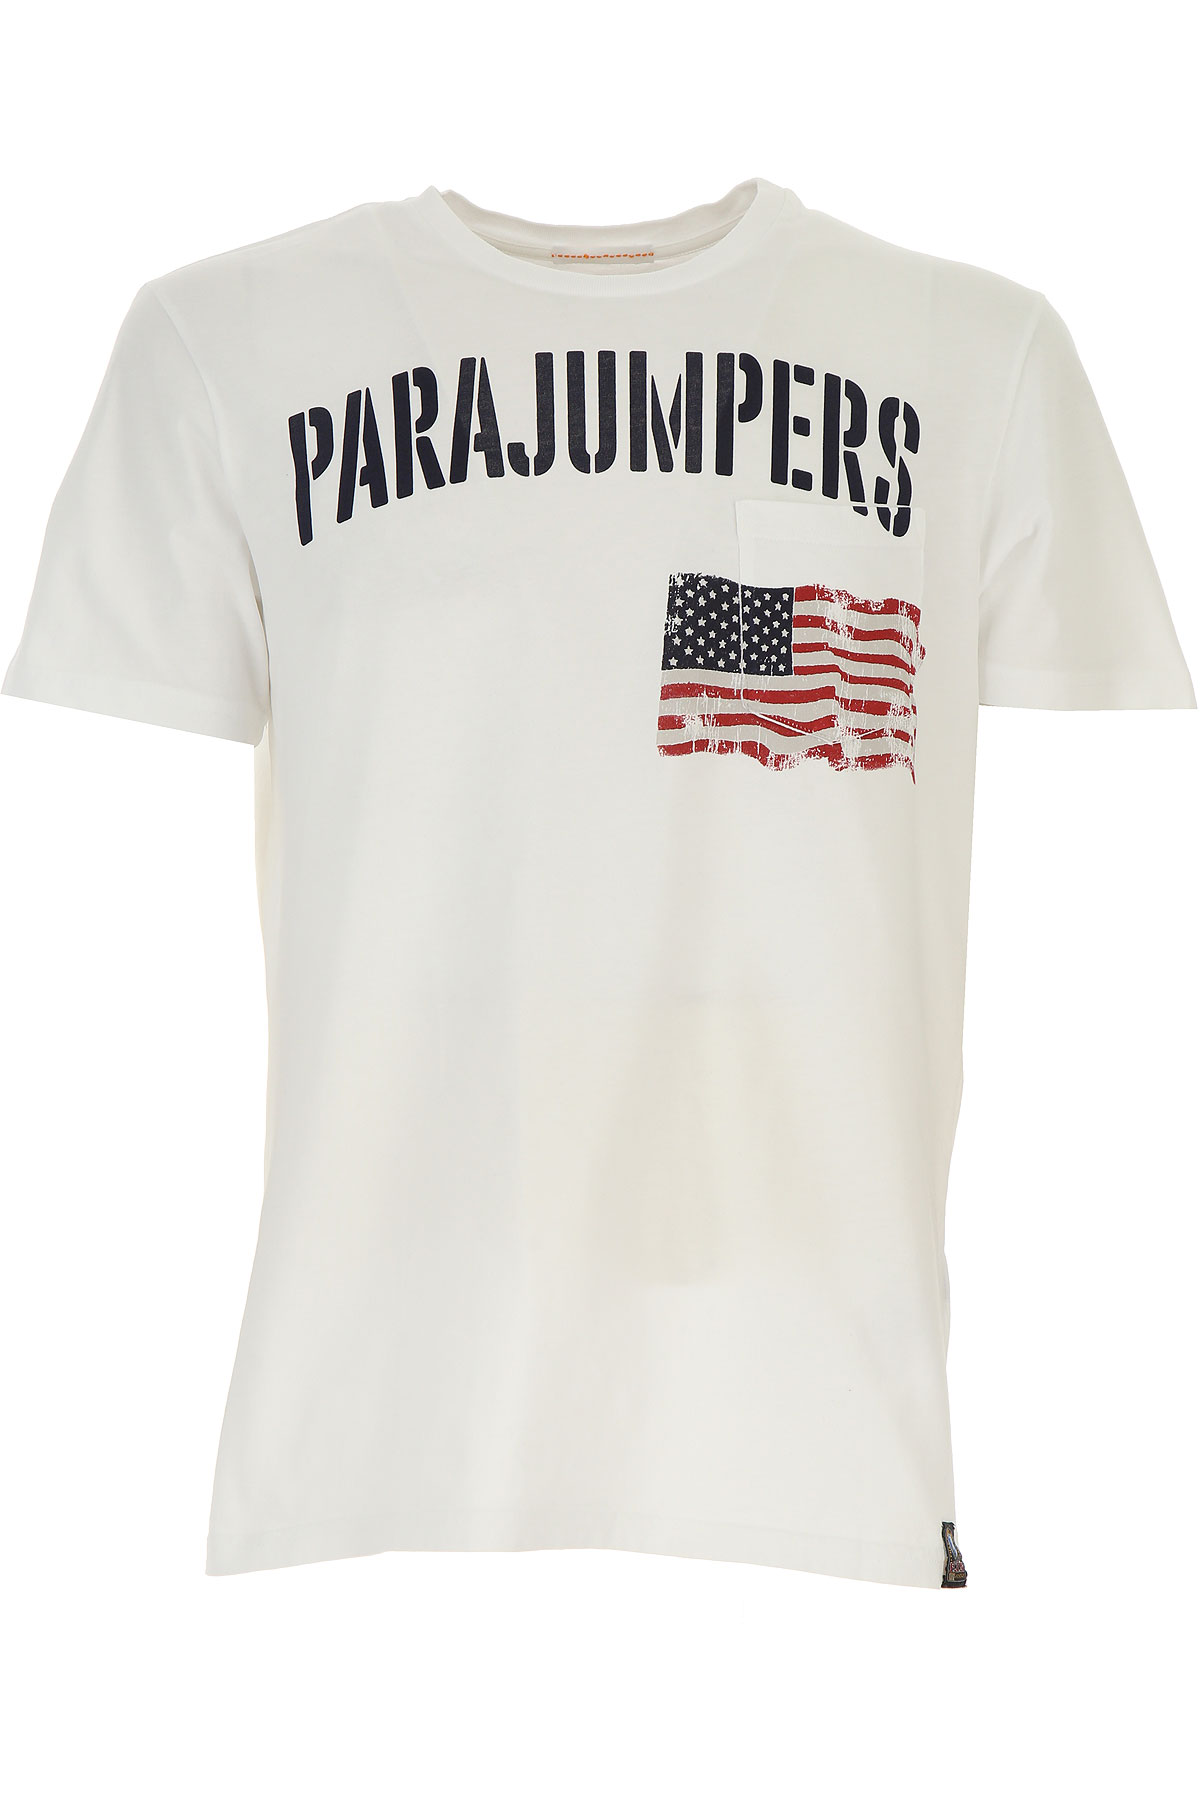 Image of Parajumpers T-Shirt for Men On Sale, White, Cotton, 2017, L M